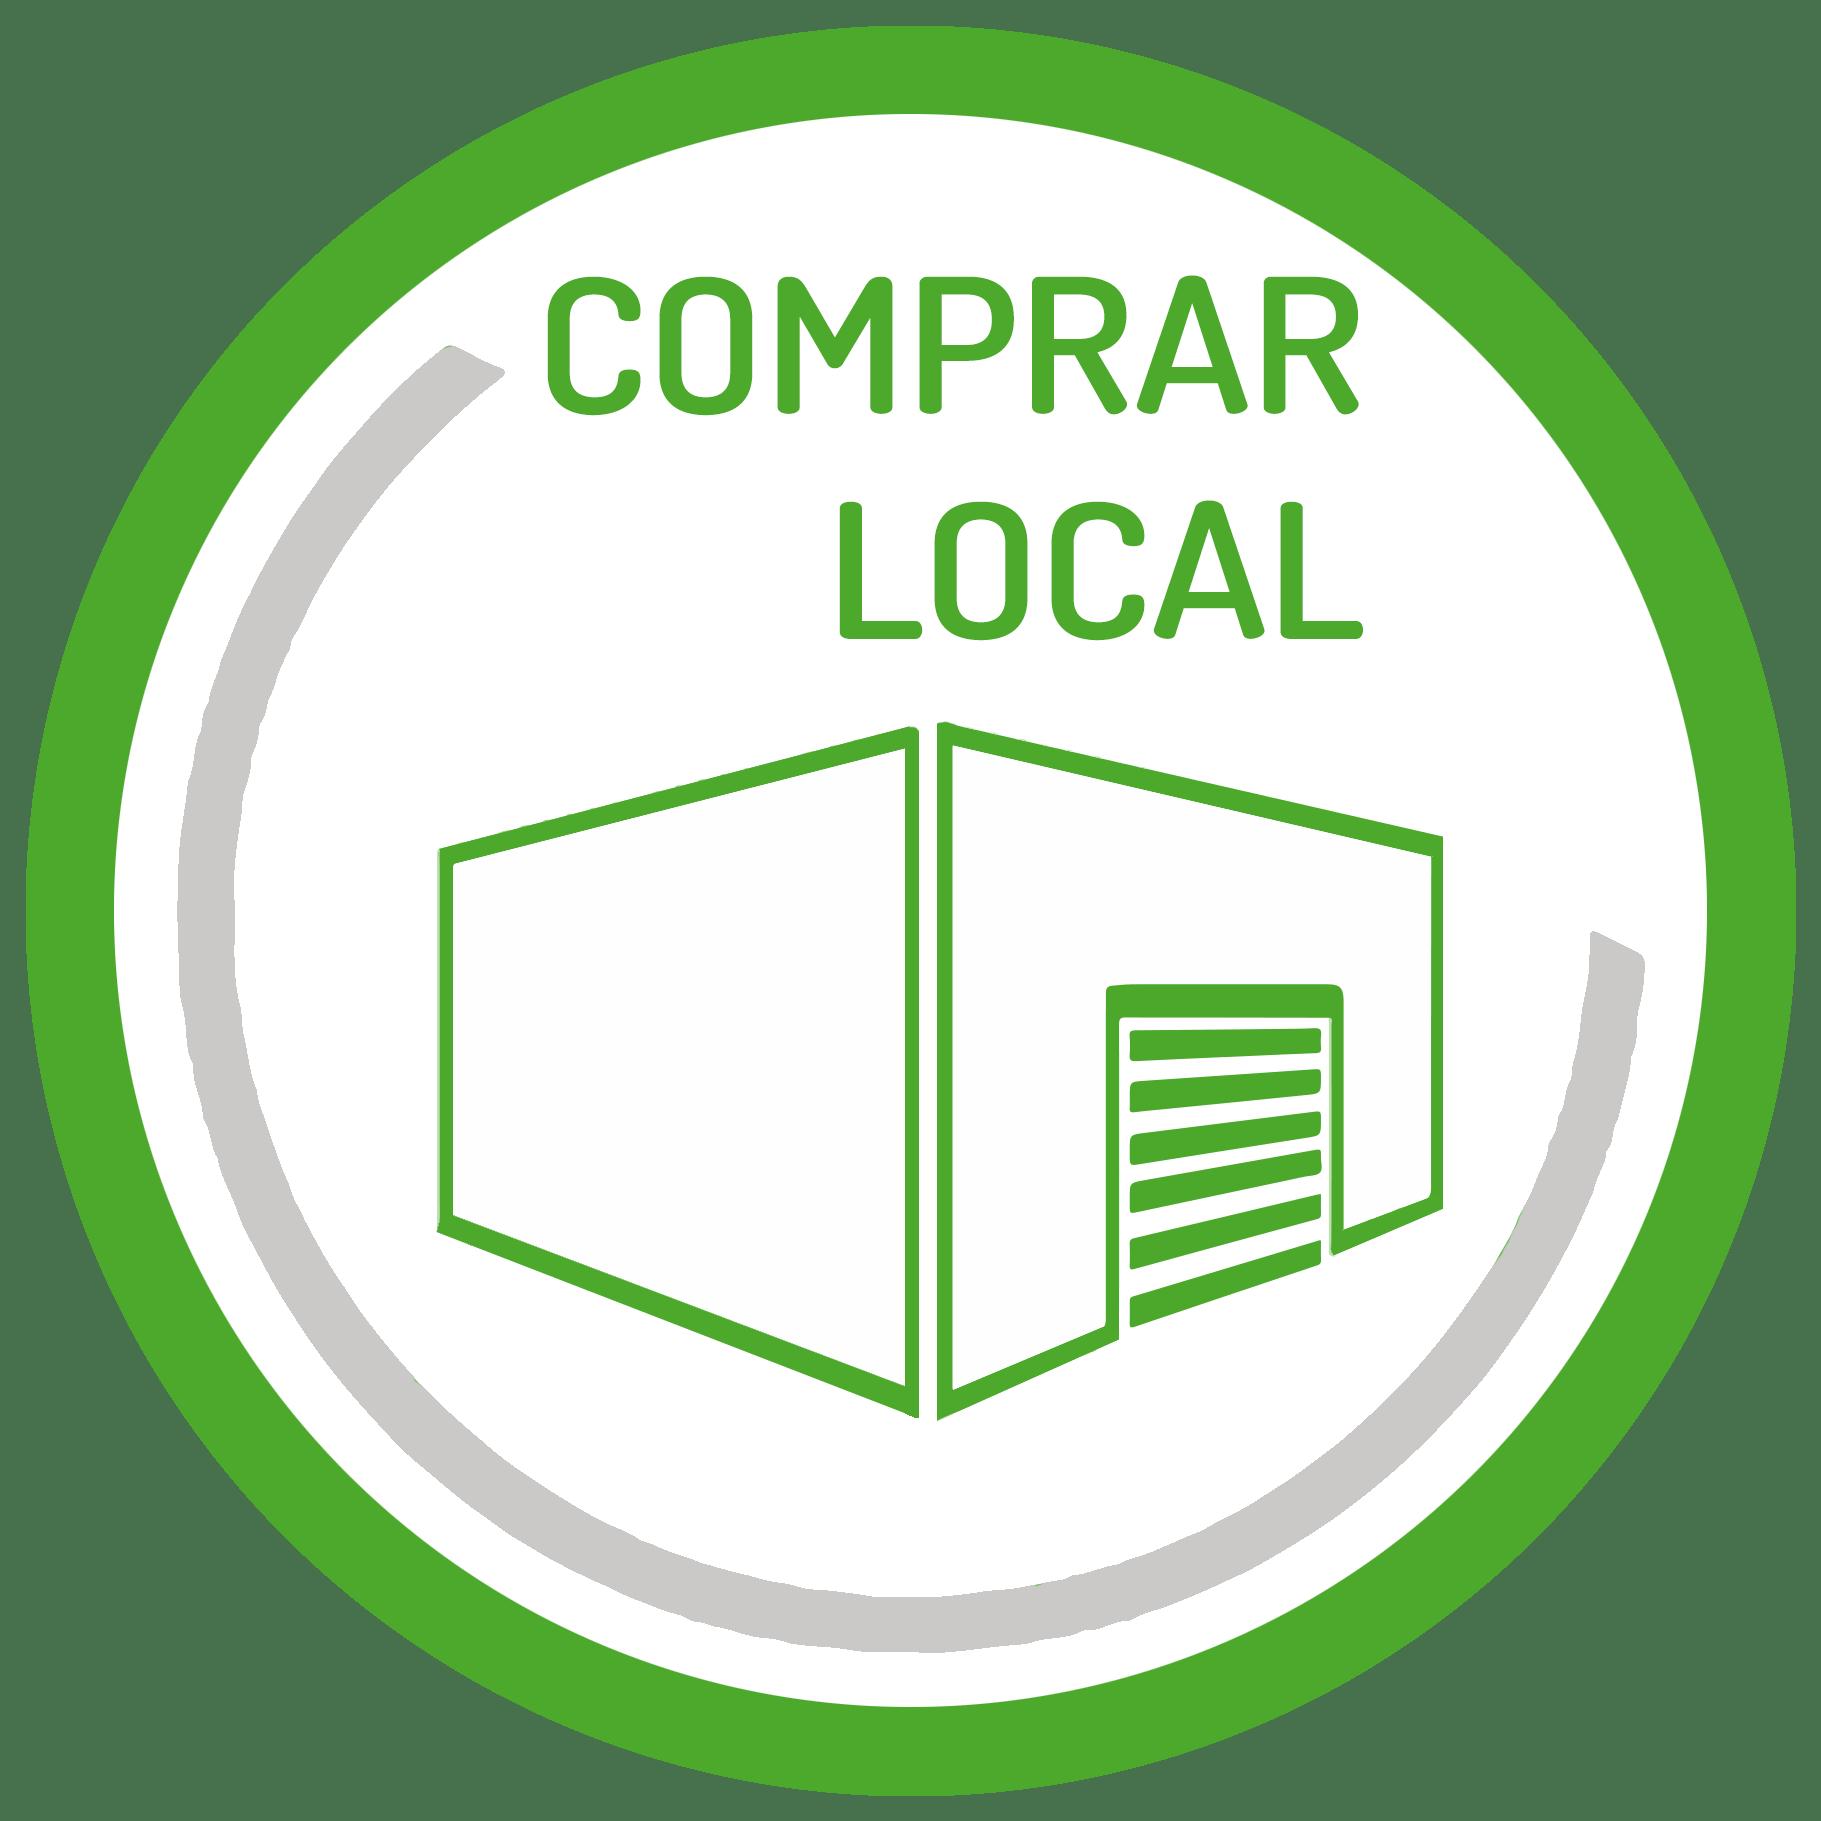 Comprar Local